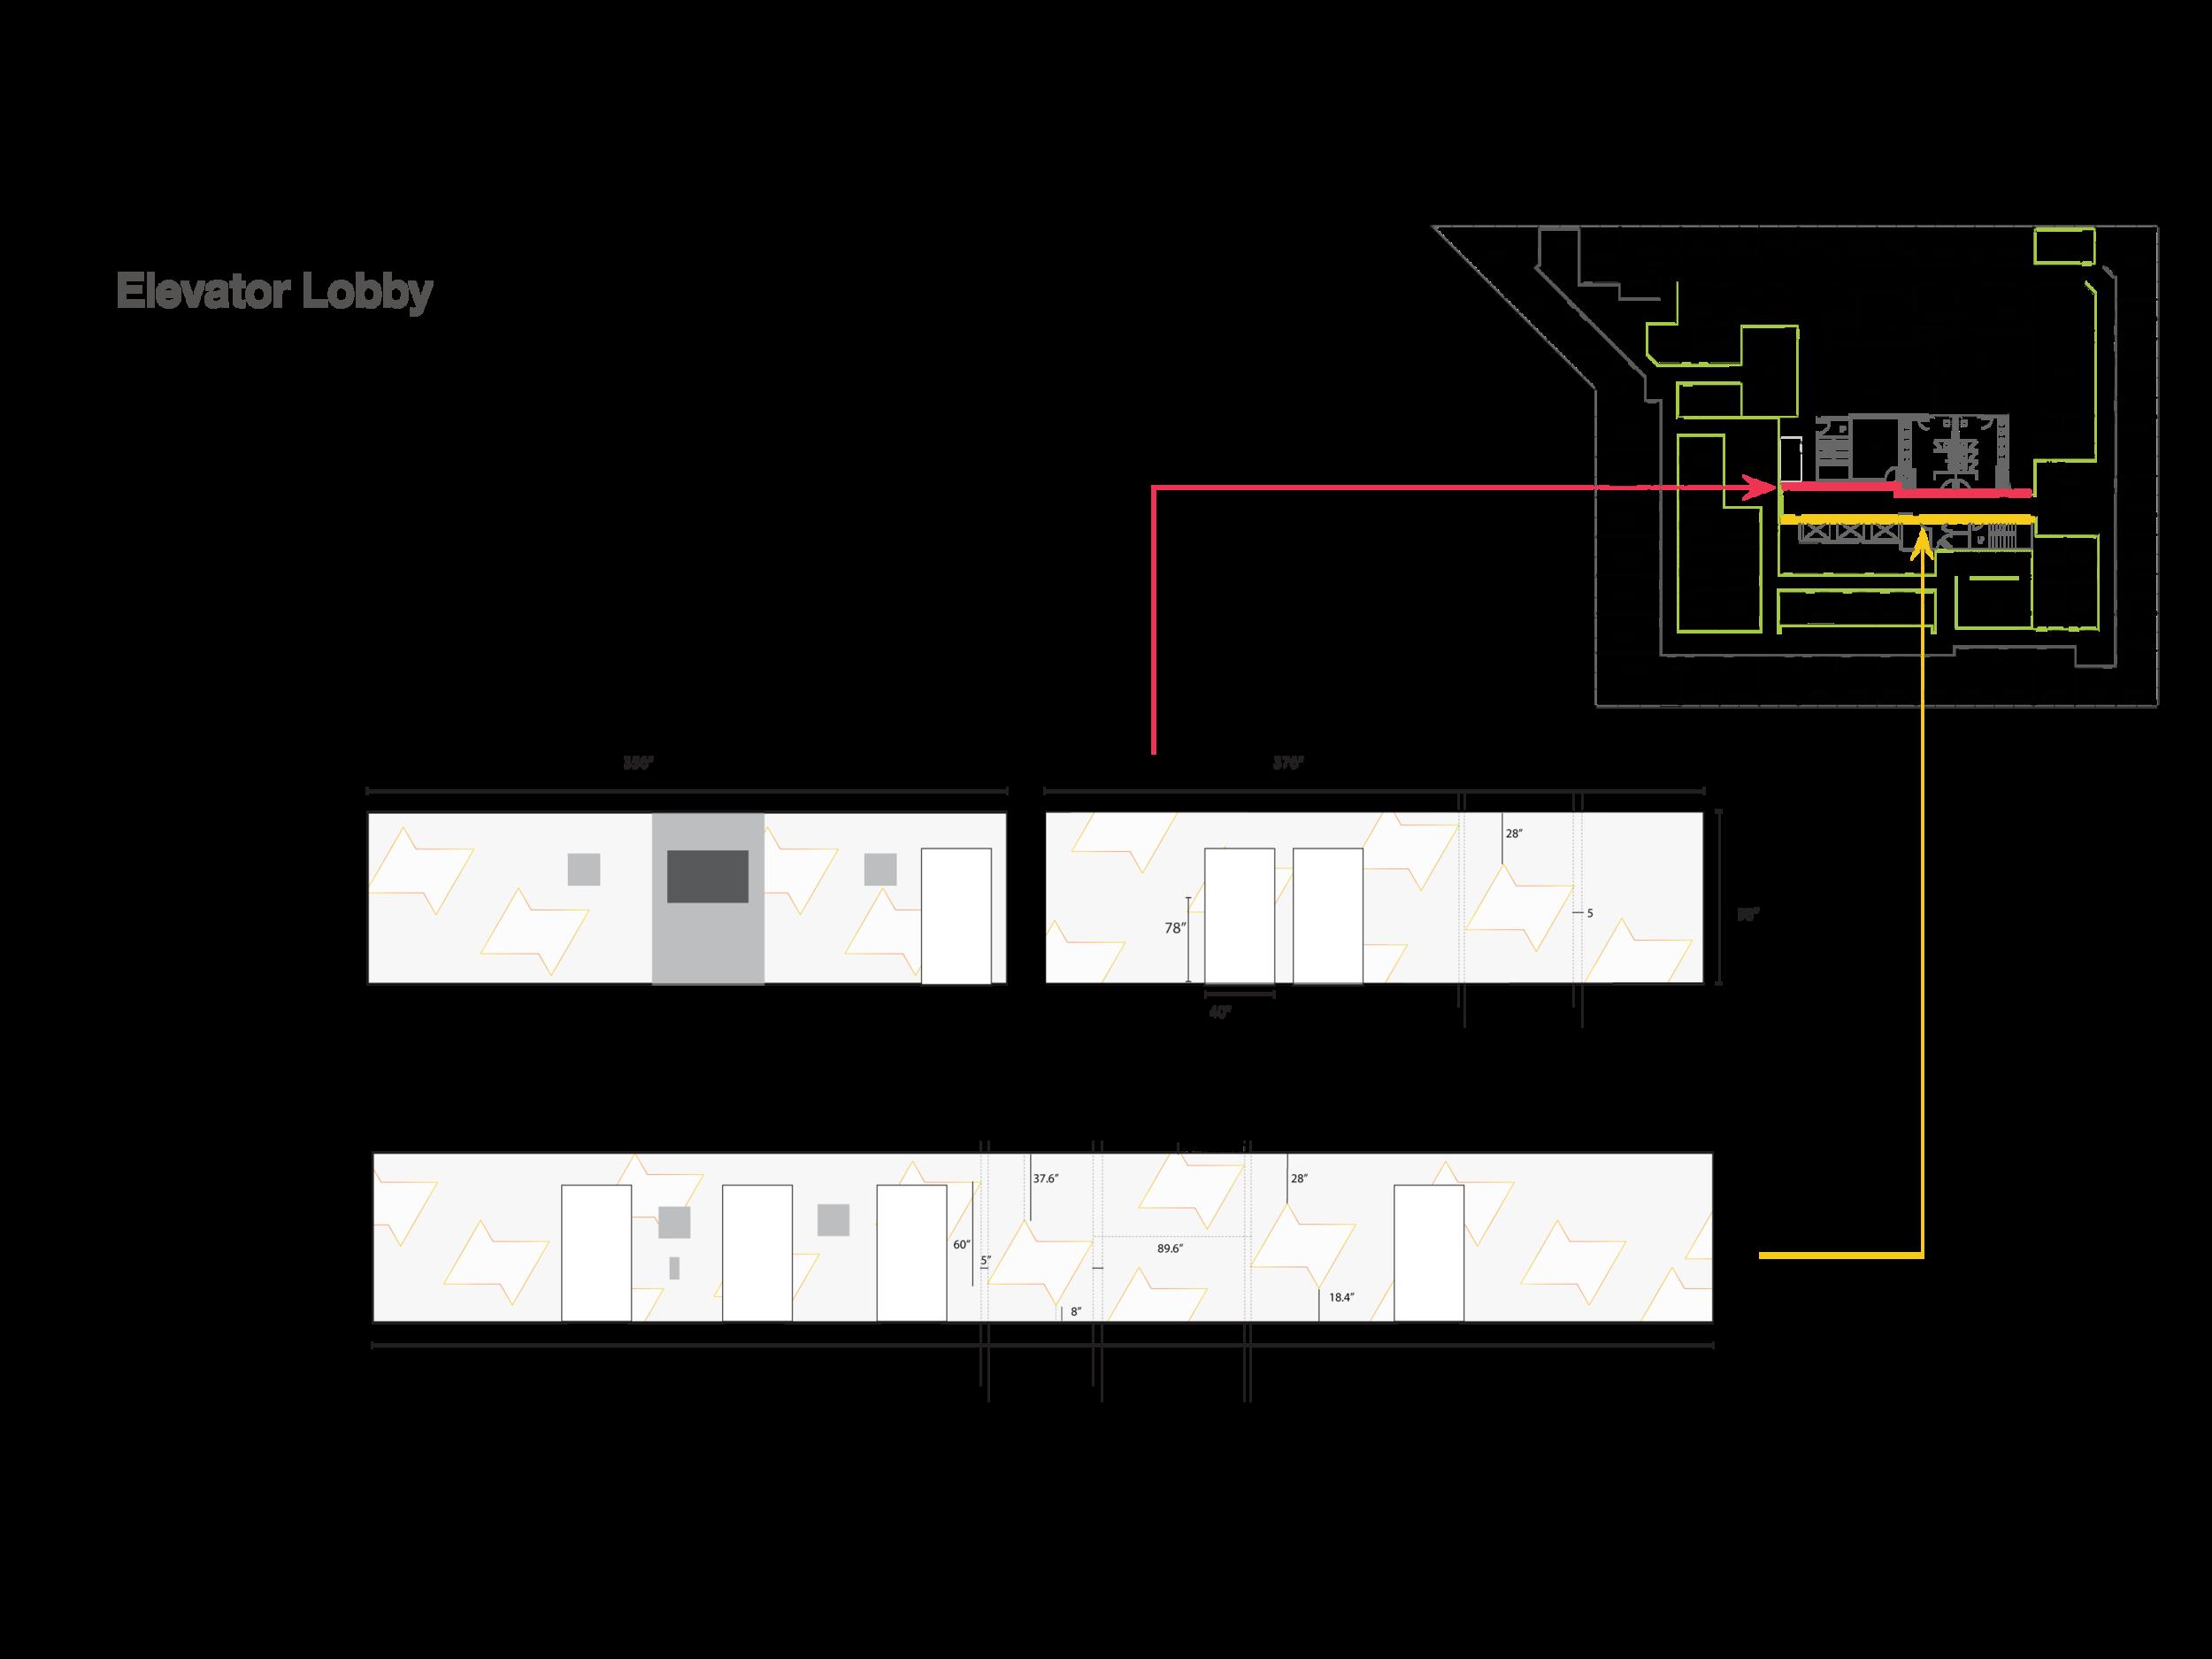 avixa-enviro-elevation-elevator_lobby.png